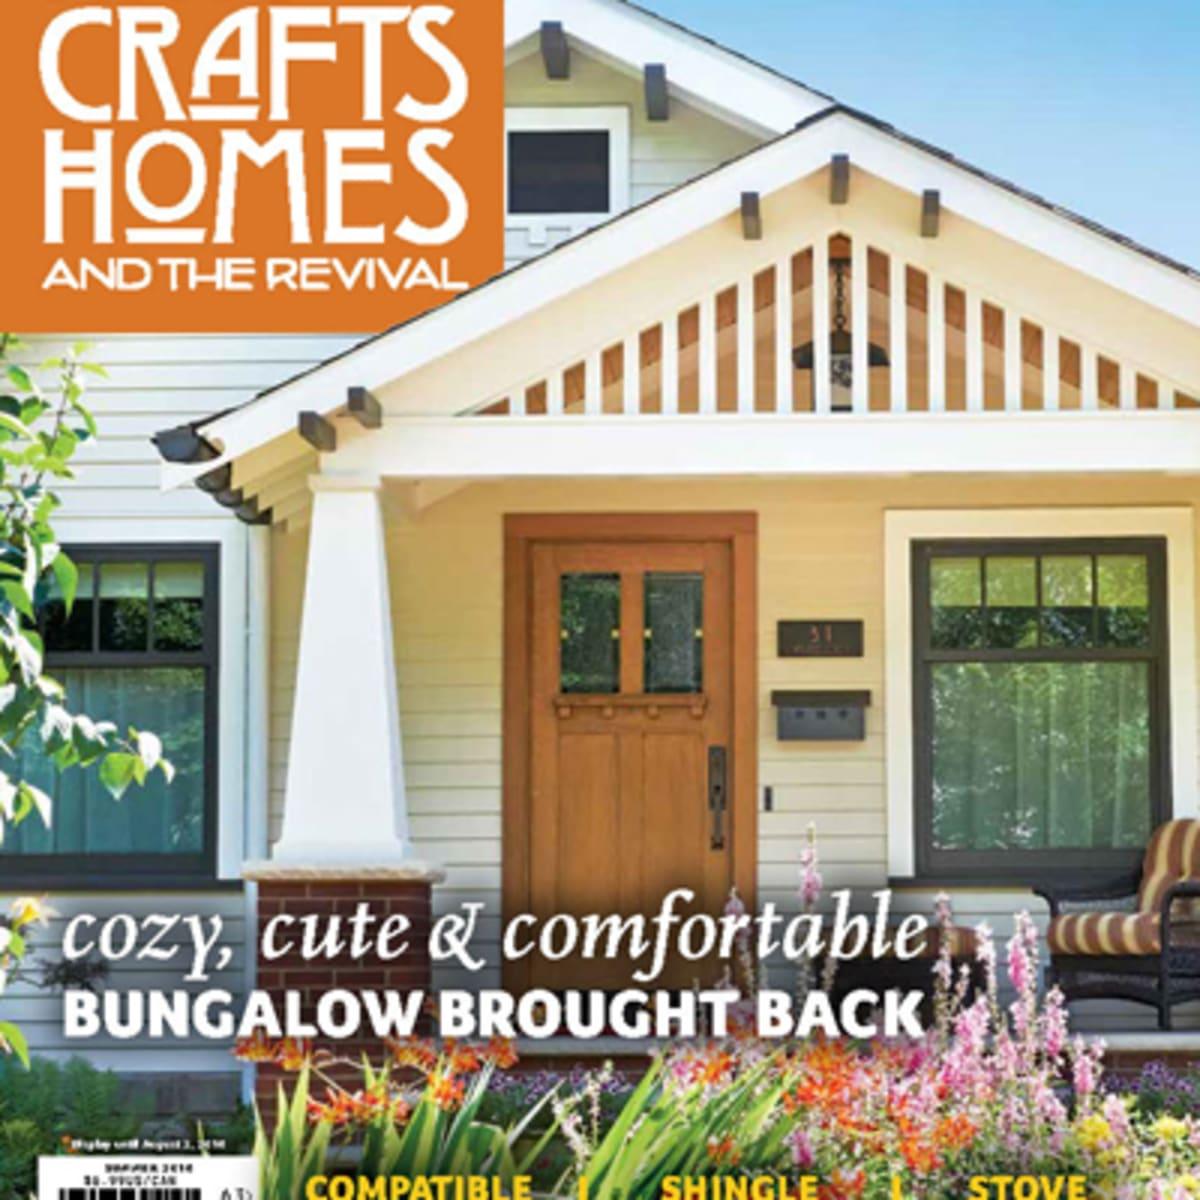 Arts Craft Homes Summer 2016 Design For The Arts Crafts House Arts Crafts Homes Online